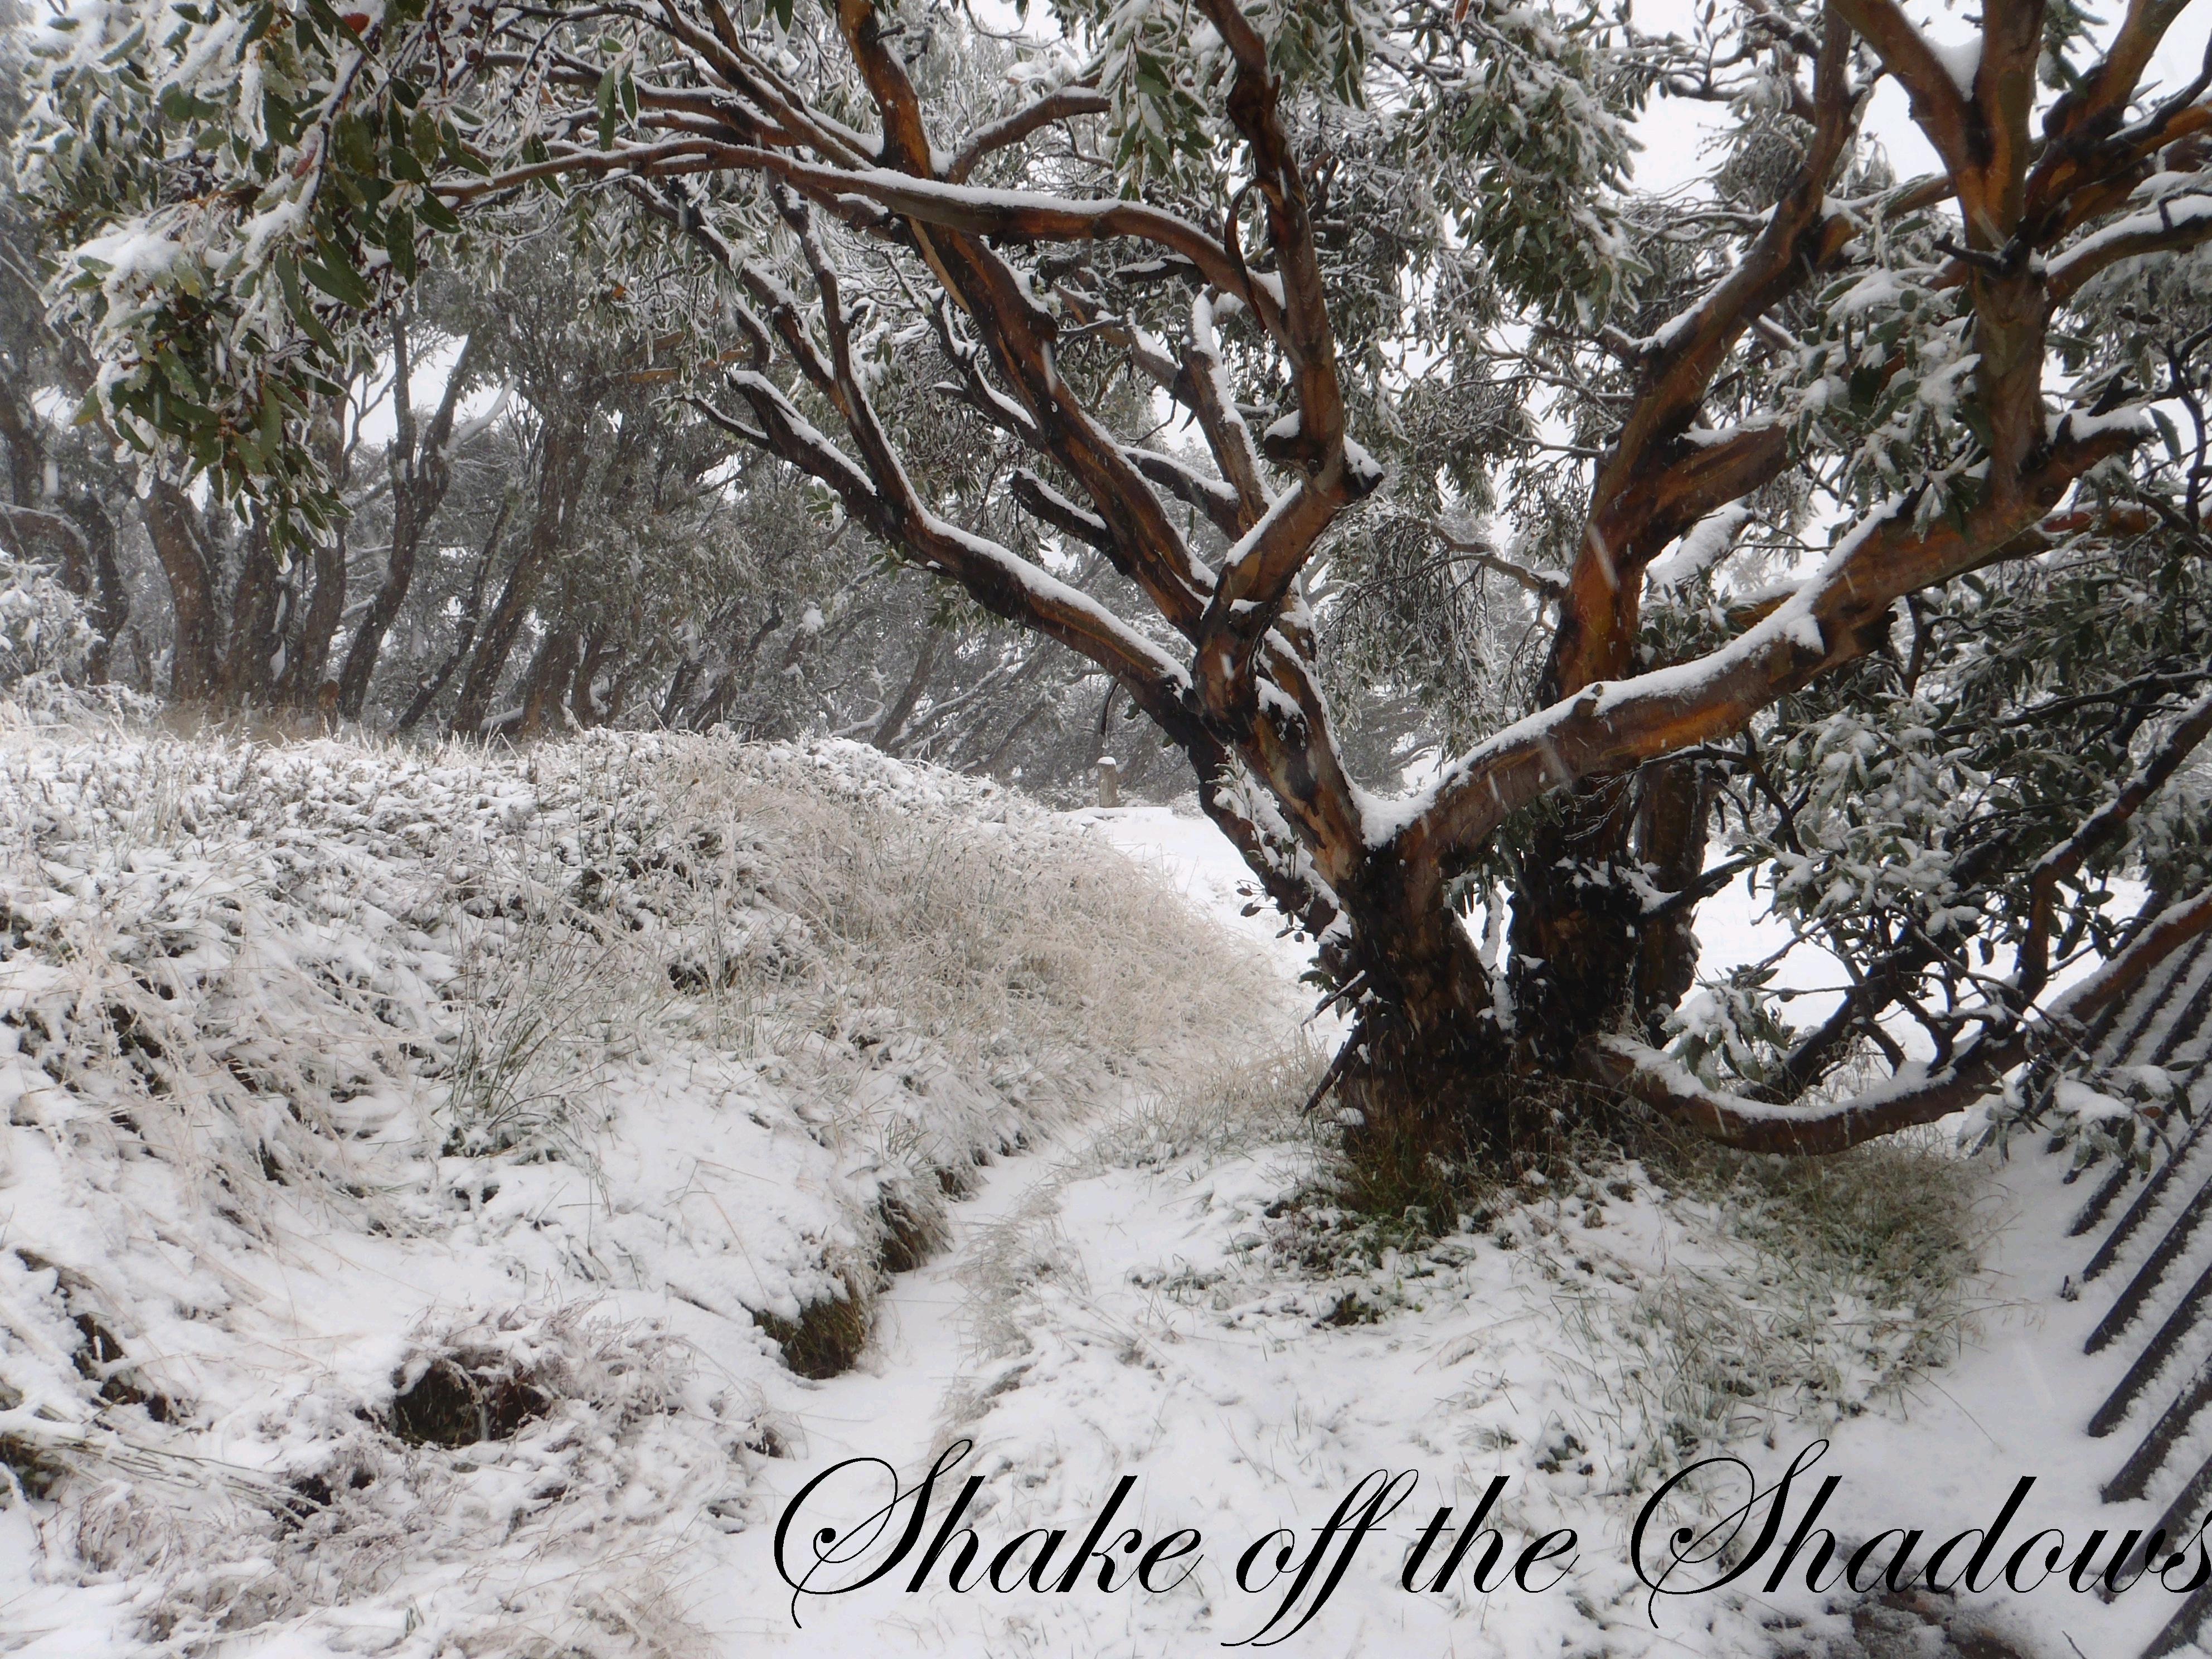 Shake Off The Shadows